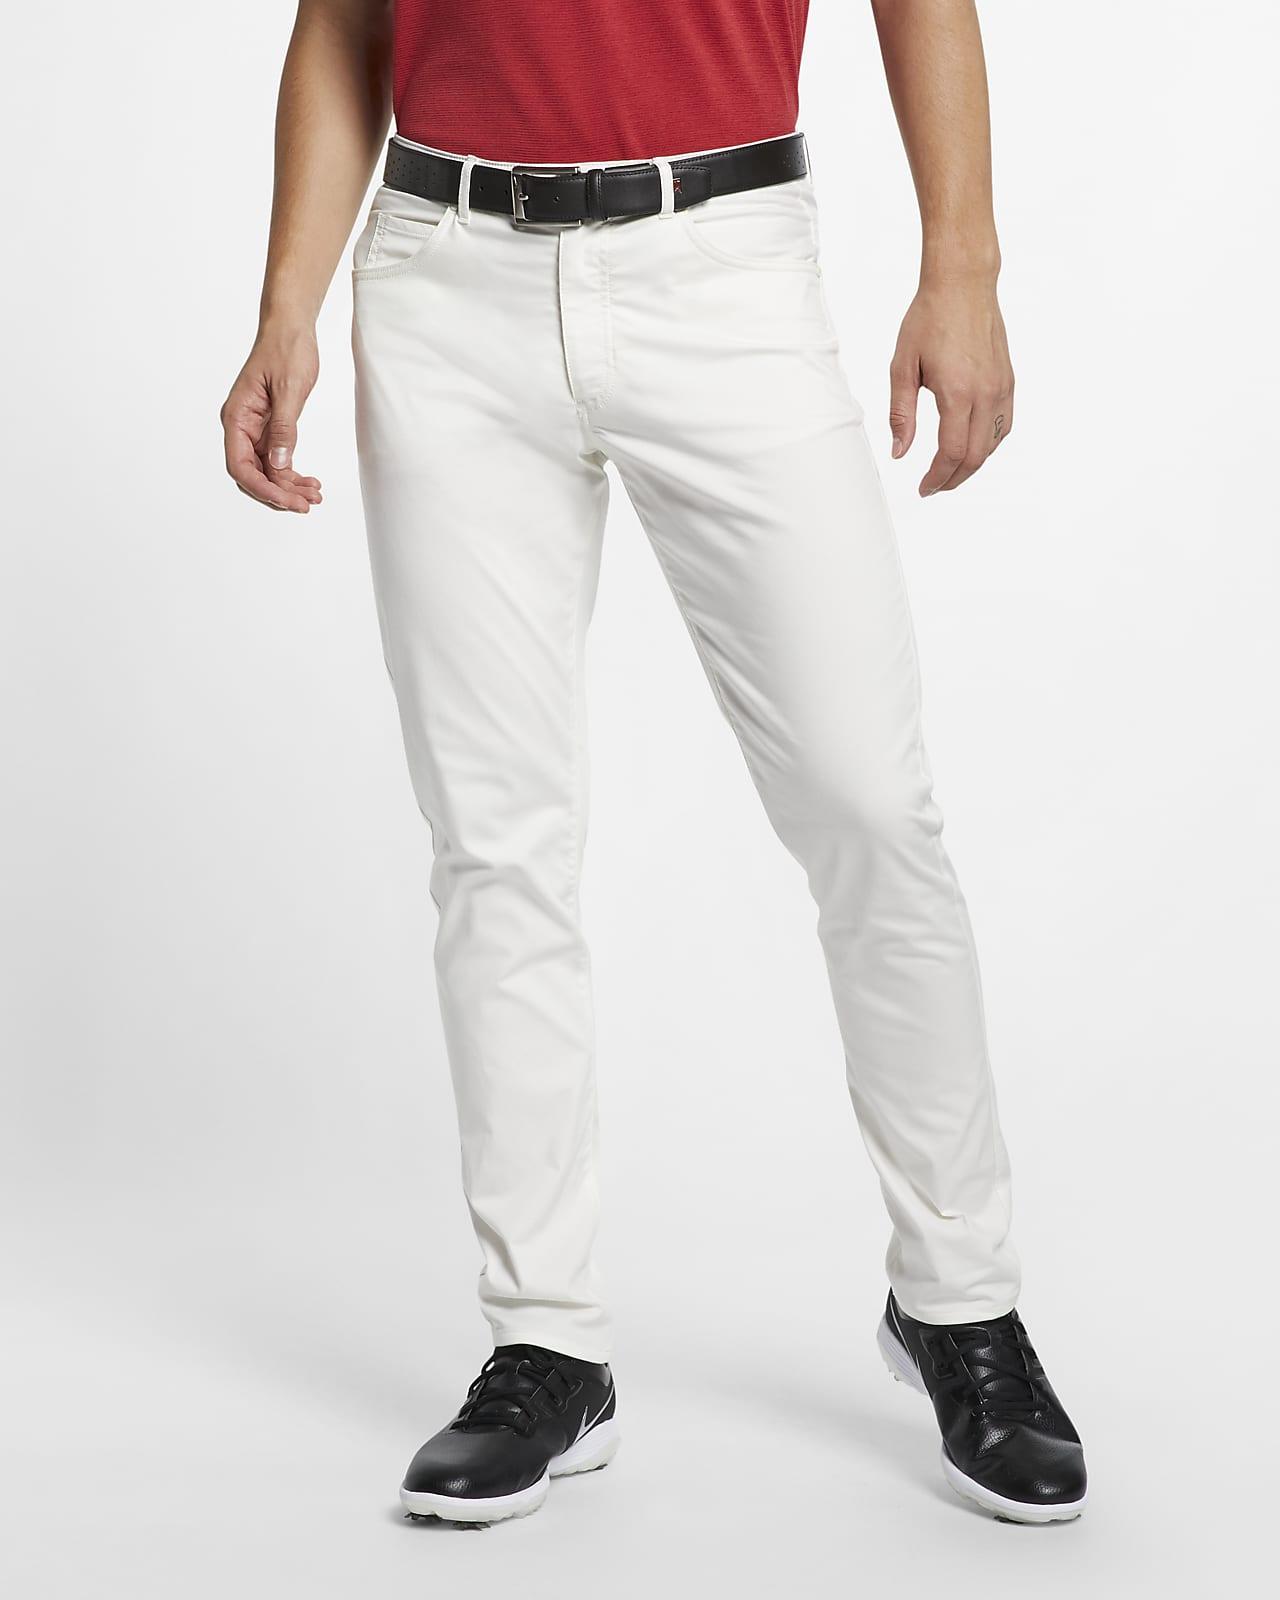 Nike Flex Slim Fit 男子高尔夫长裤